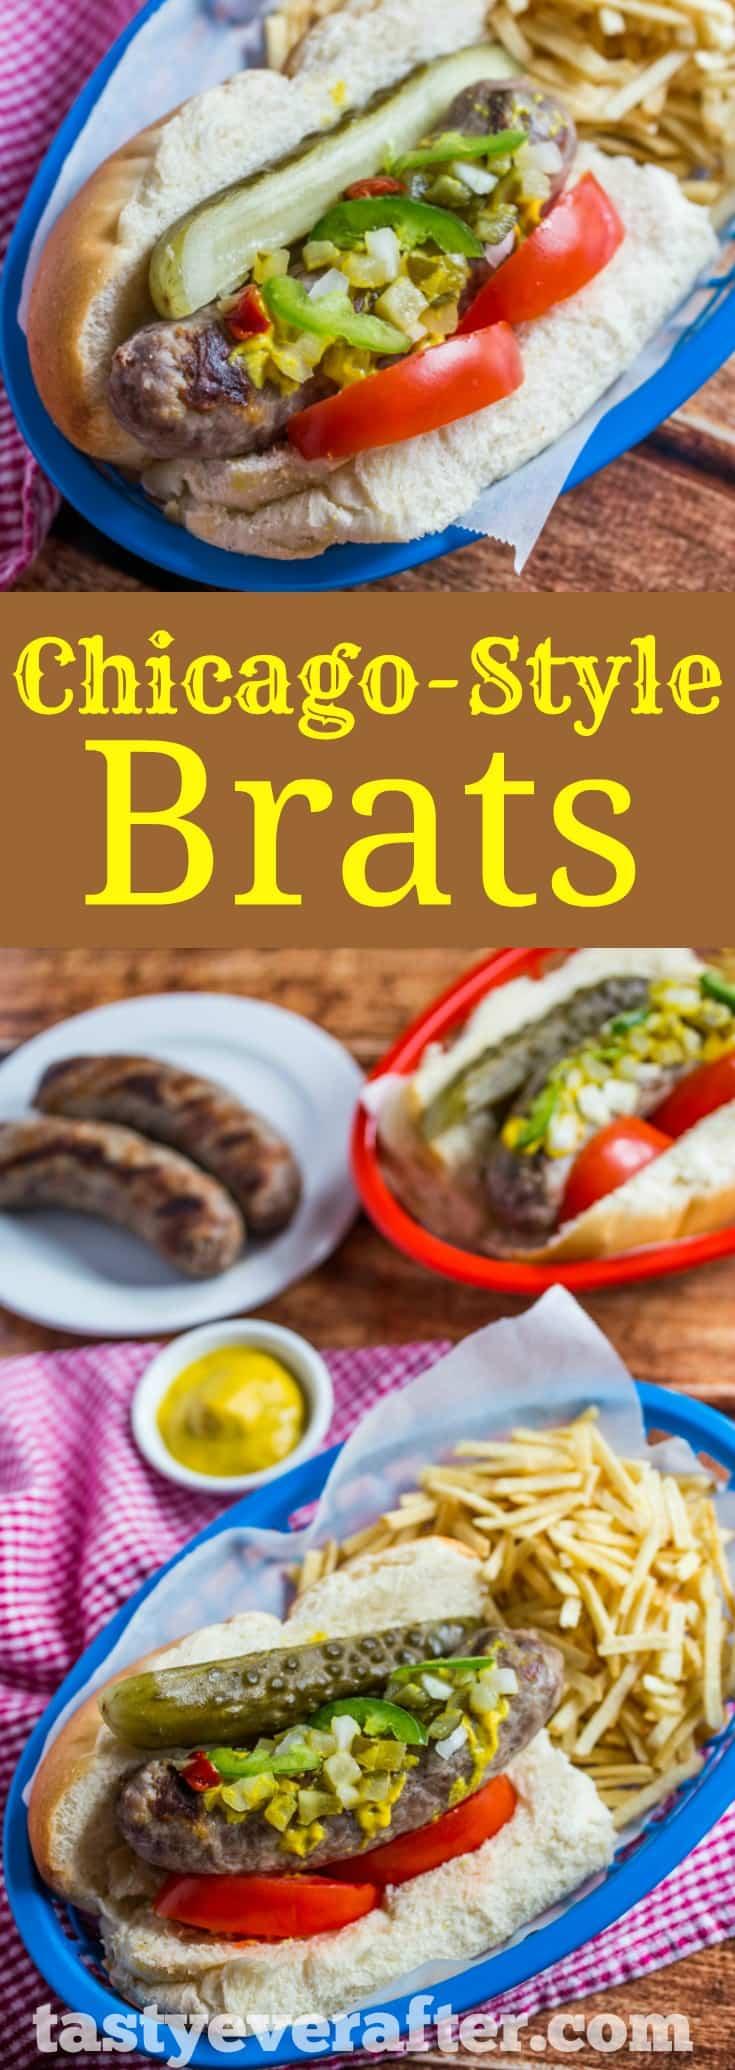 Chicago-Style Brats Recipe